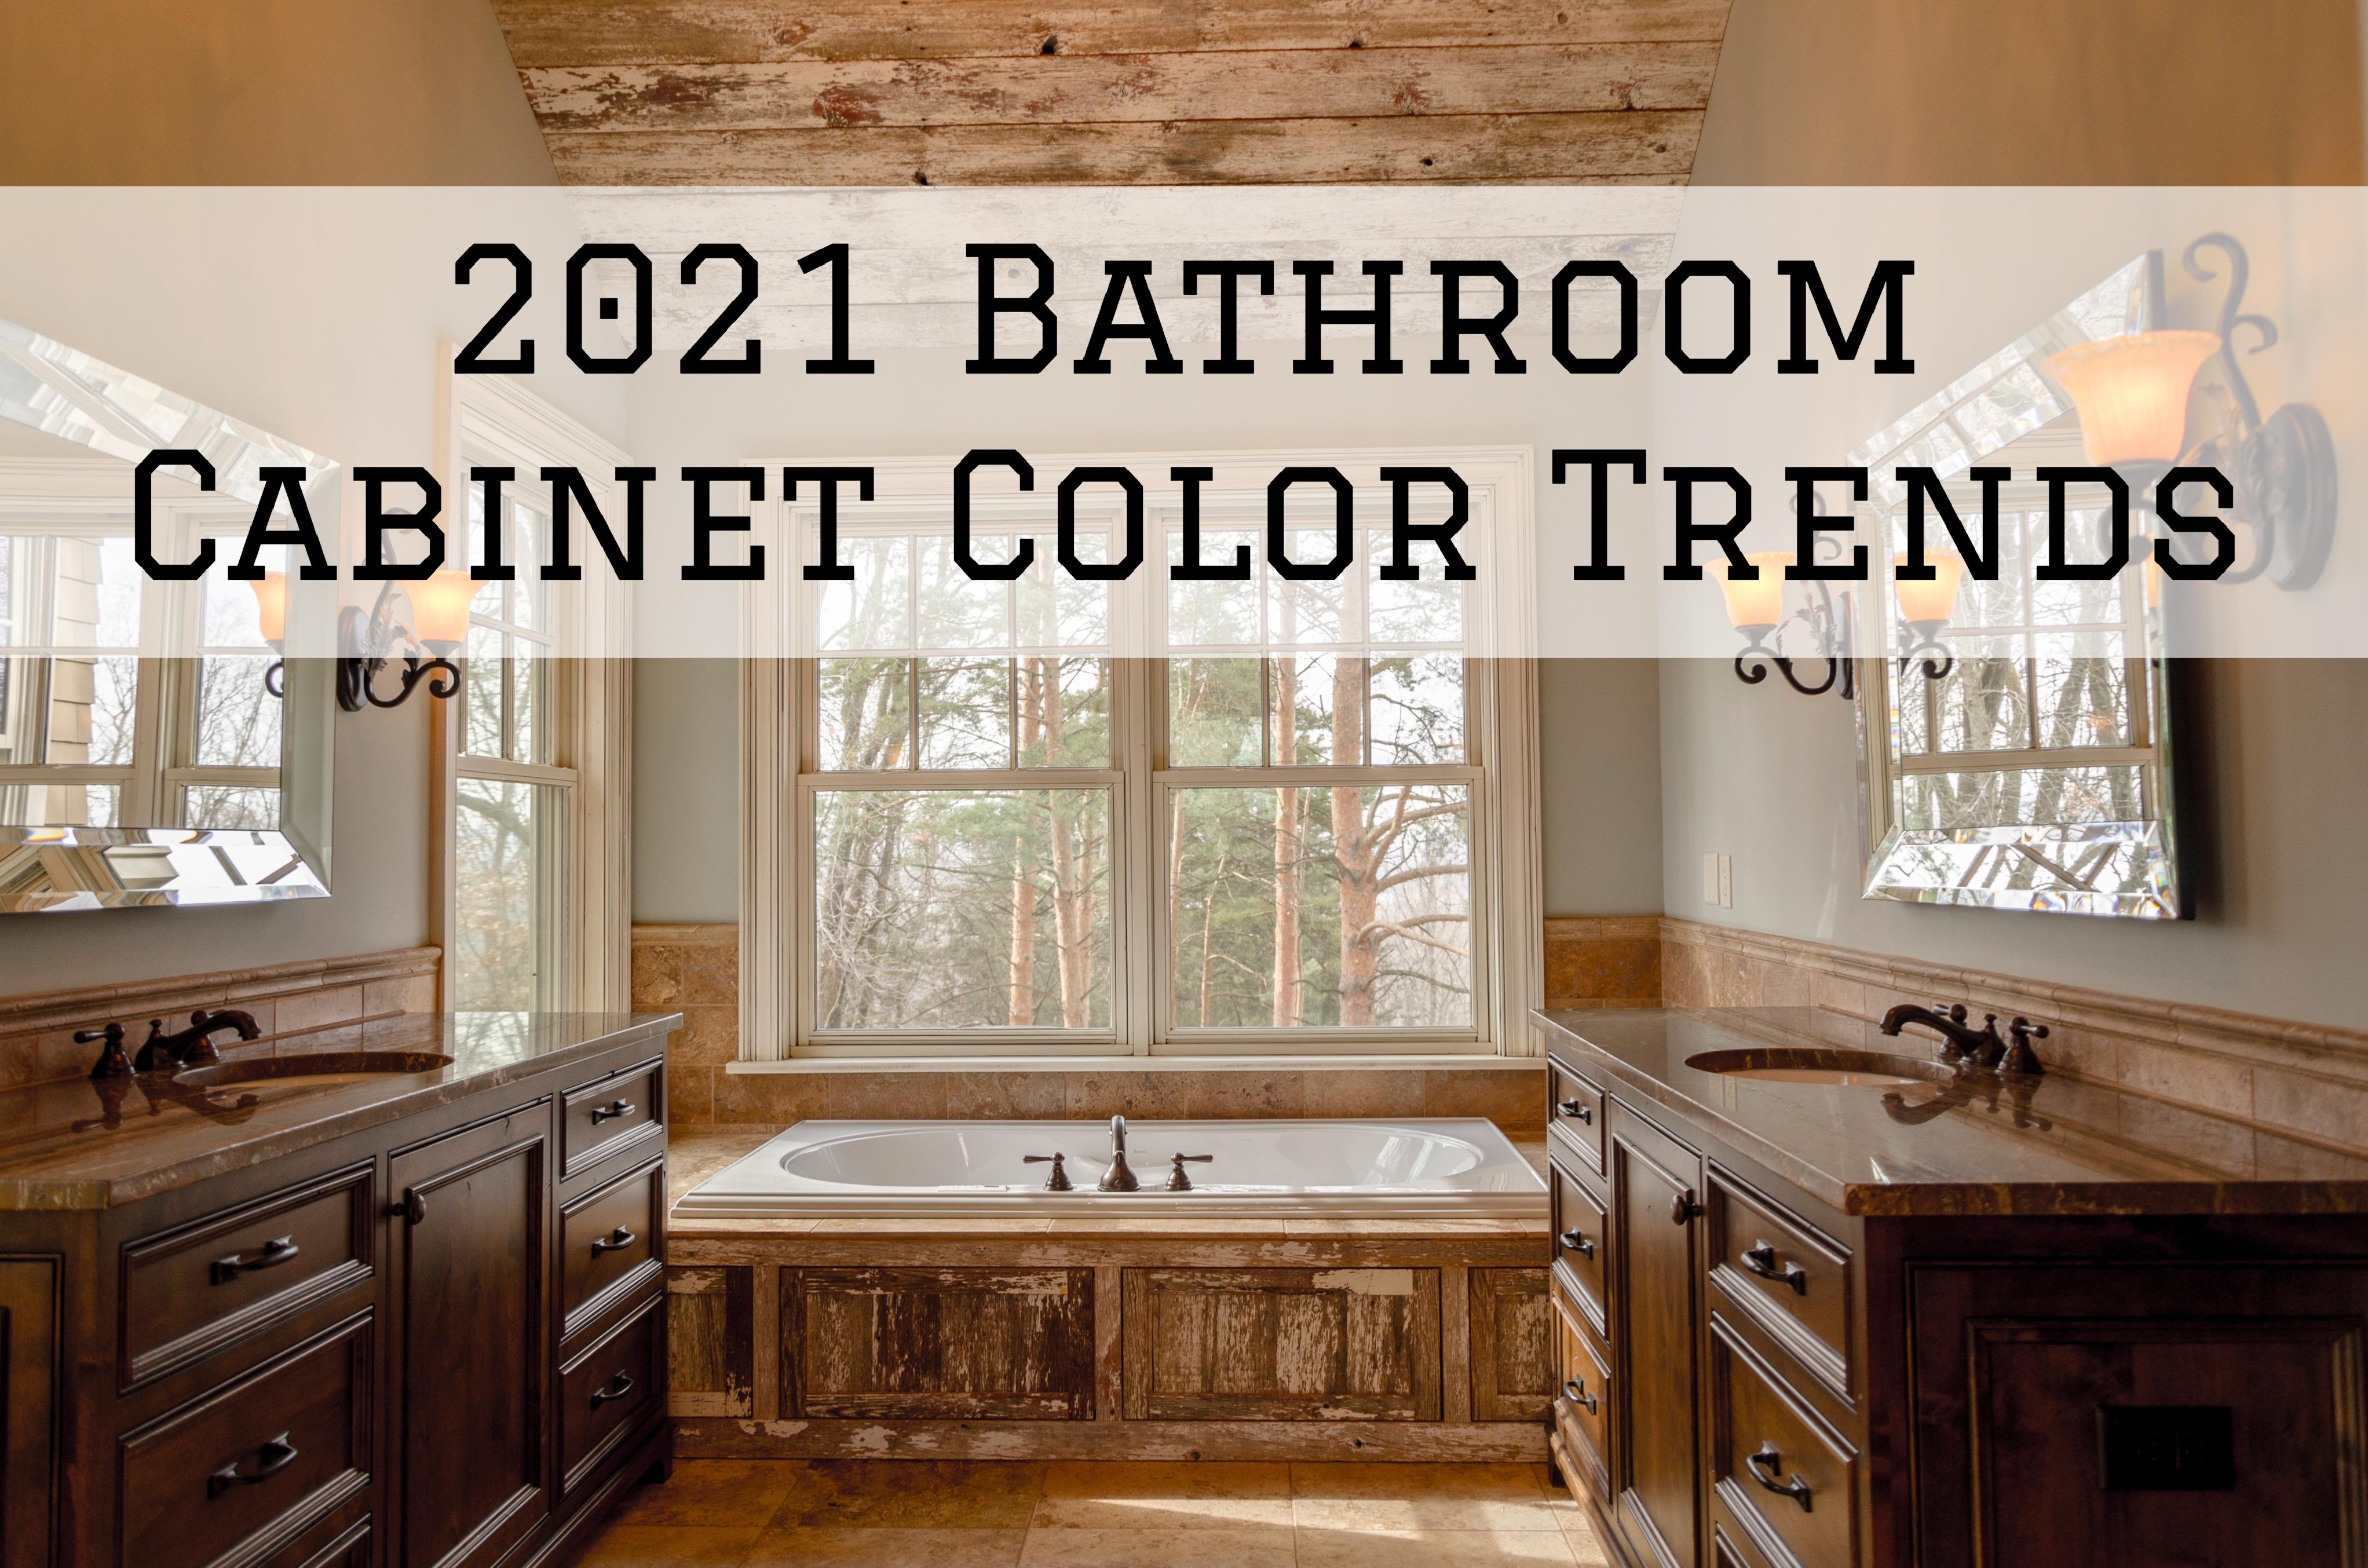 2021 Bathroom Cabinet Color Trends in Omaha, NE